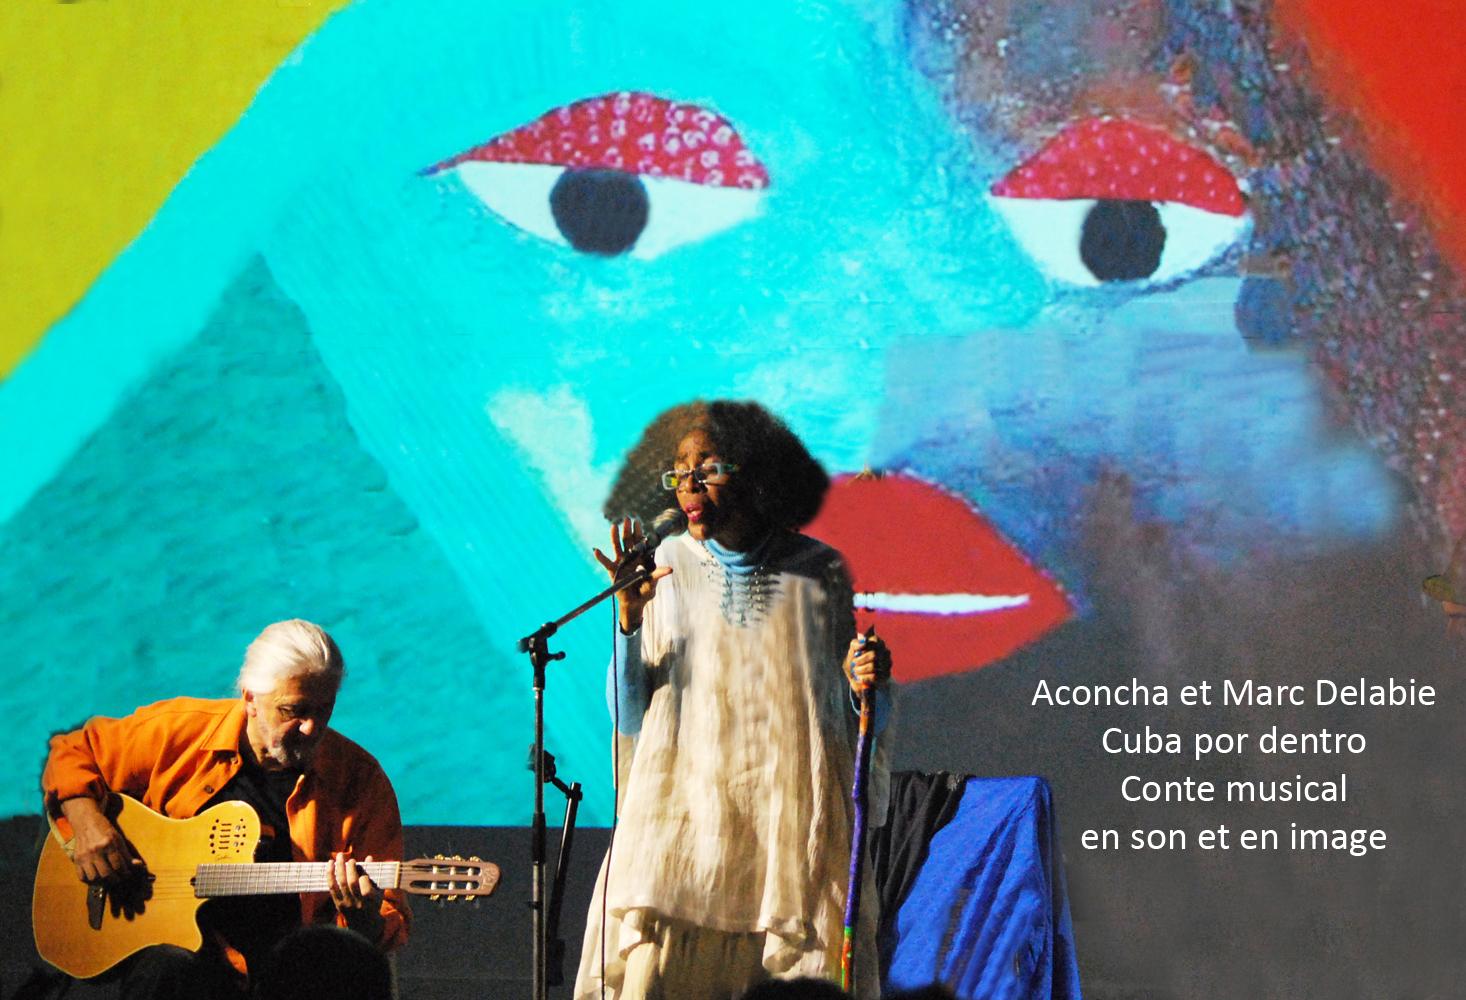 Aconcha-duo.Cuba por dentro